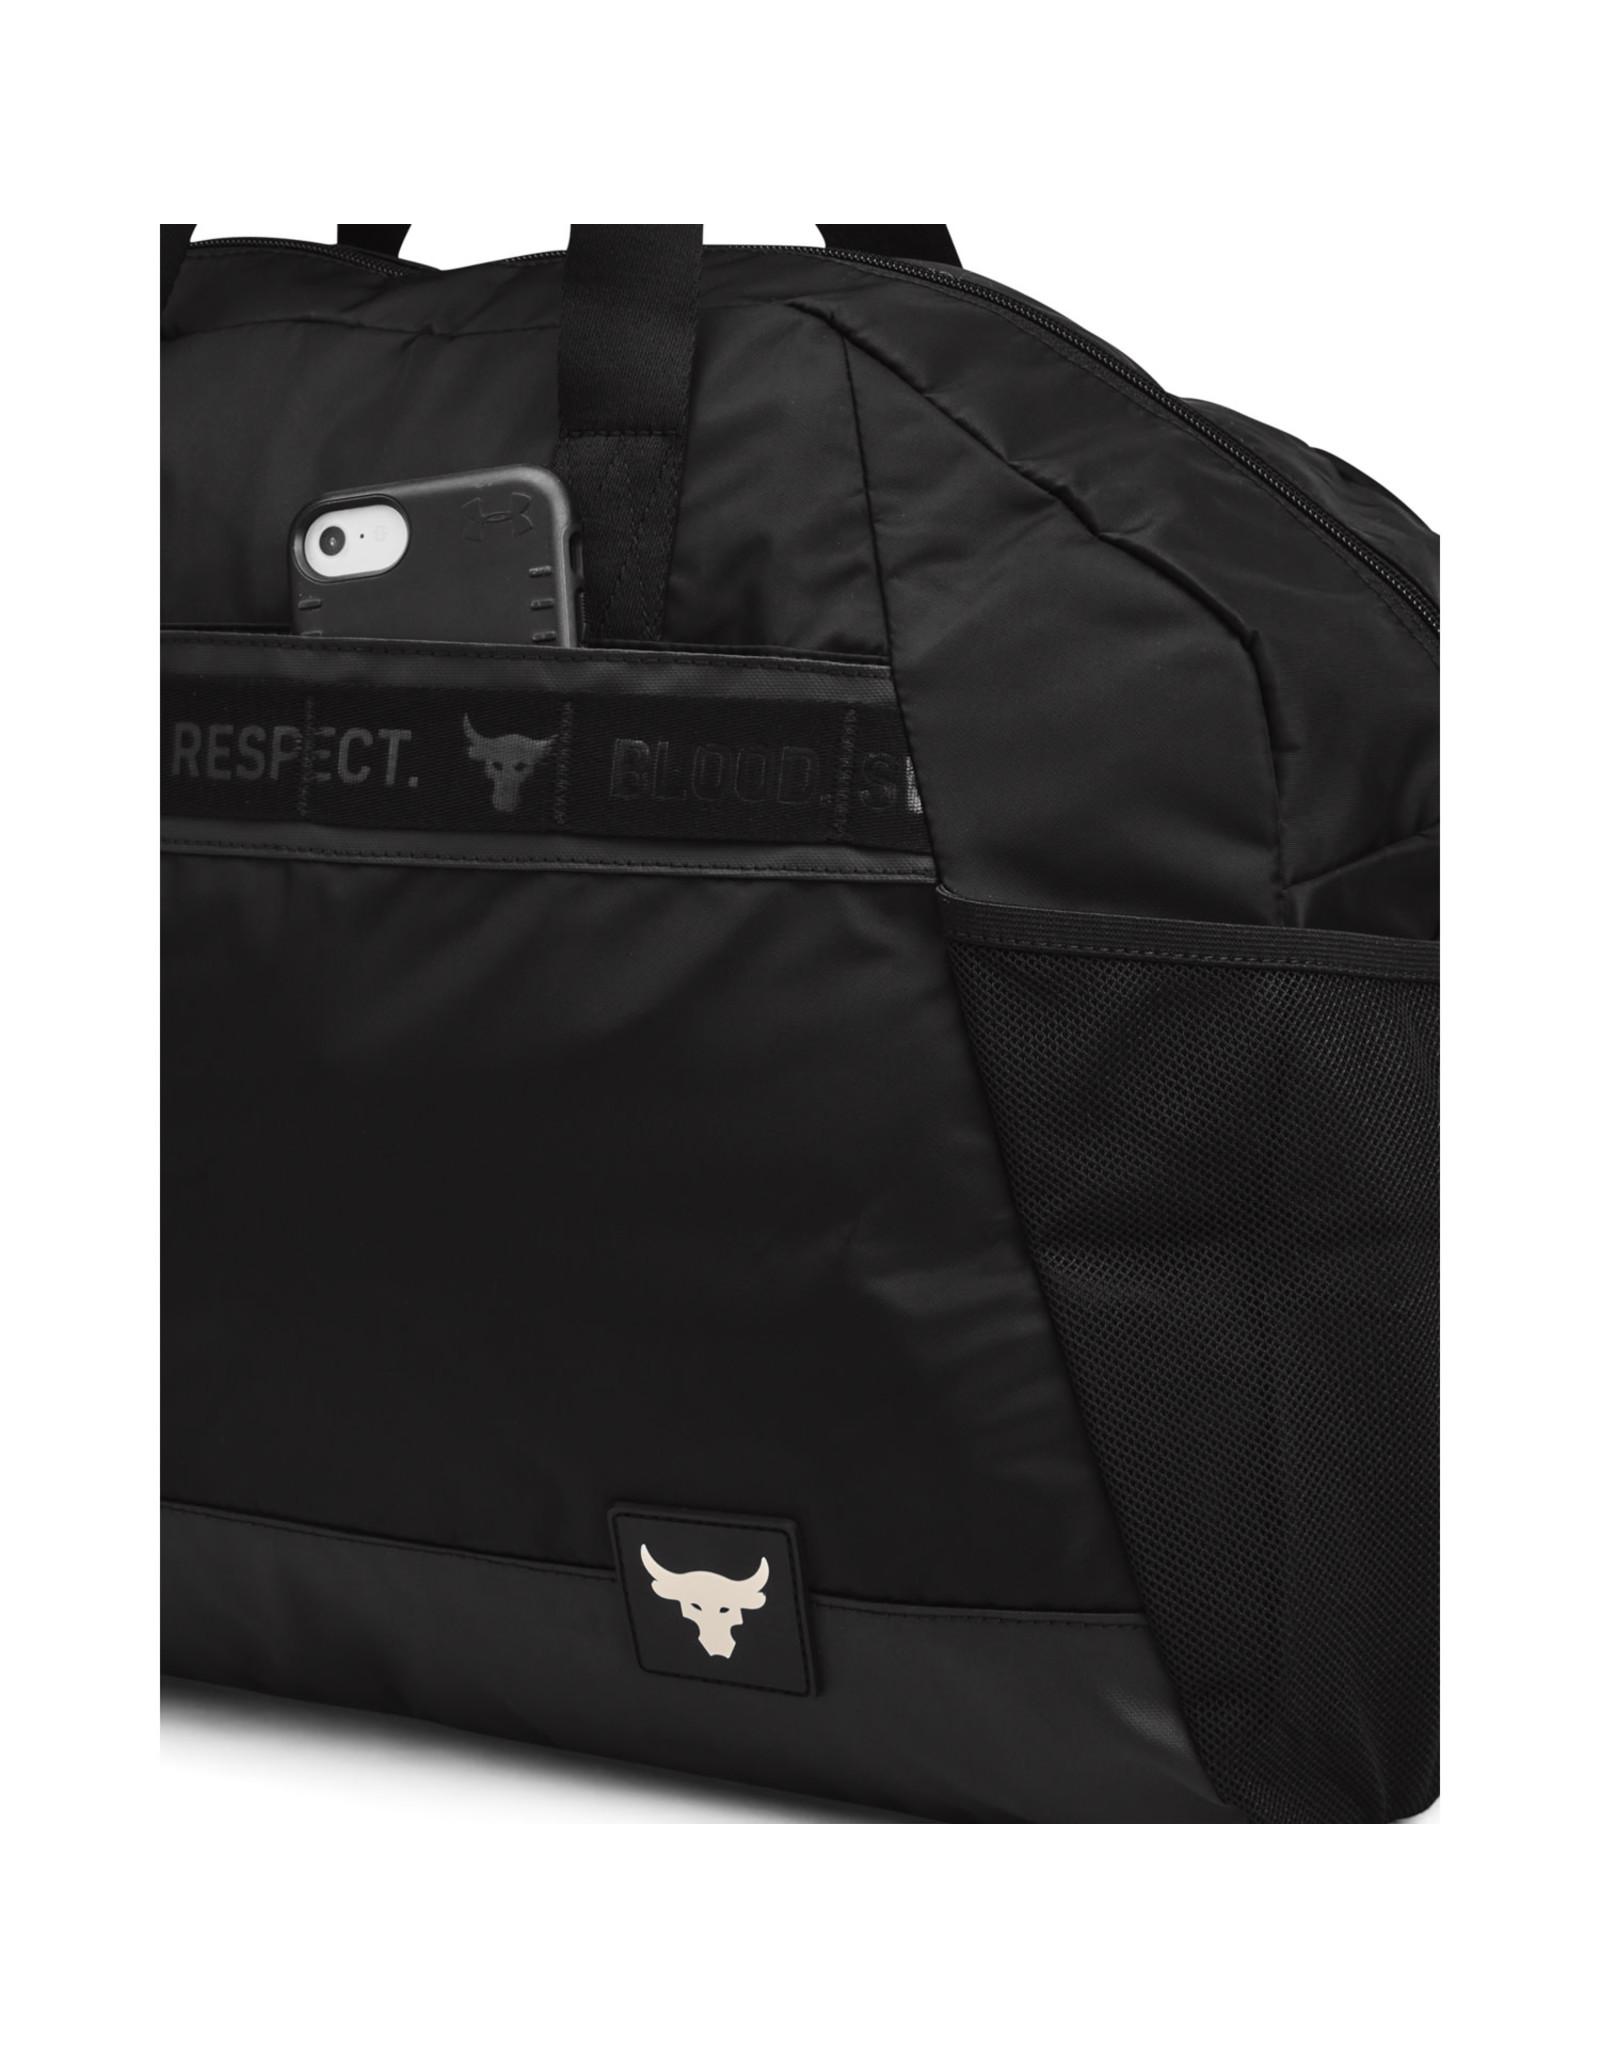 Under Armour UA Project Rock Gym Bag-Black